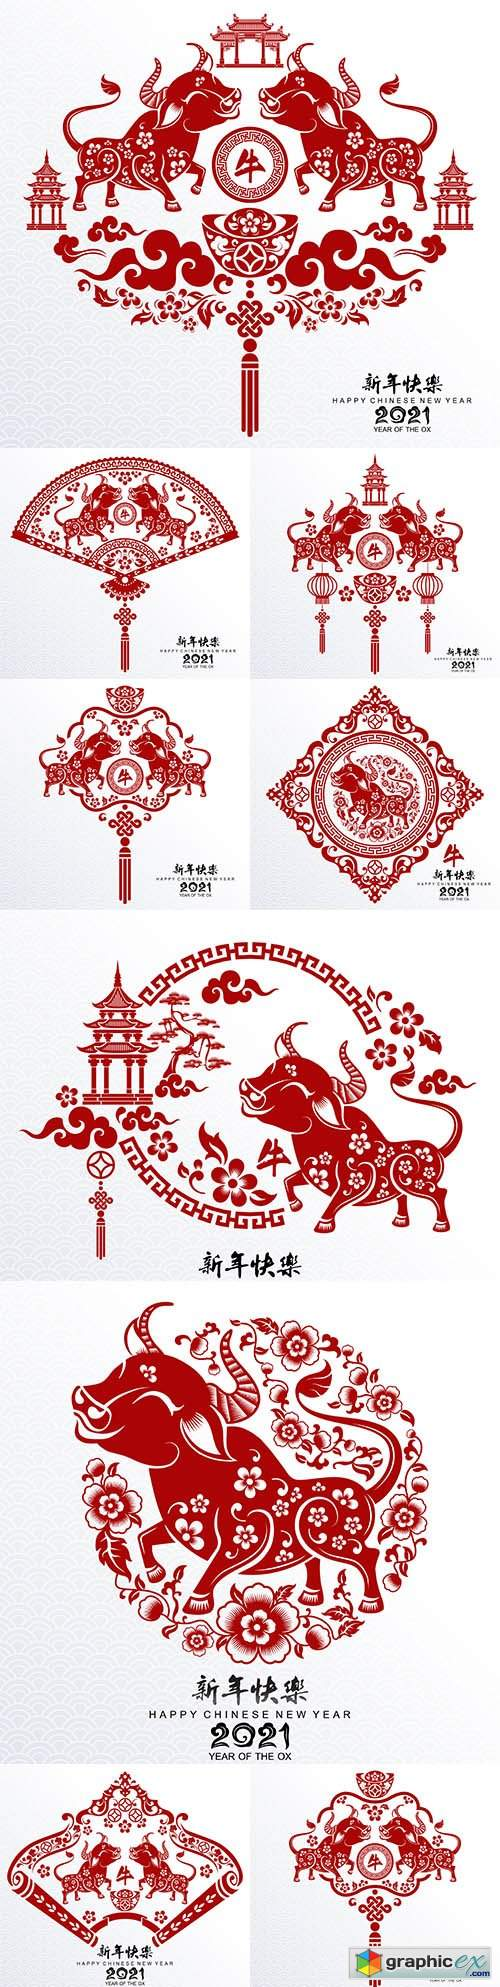 Chinese New 2021 Bull Asian Background Design